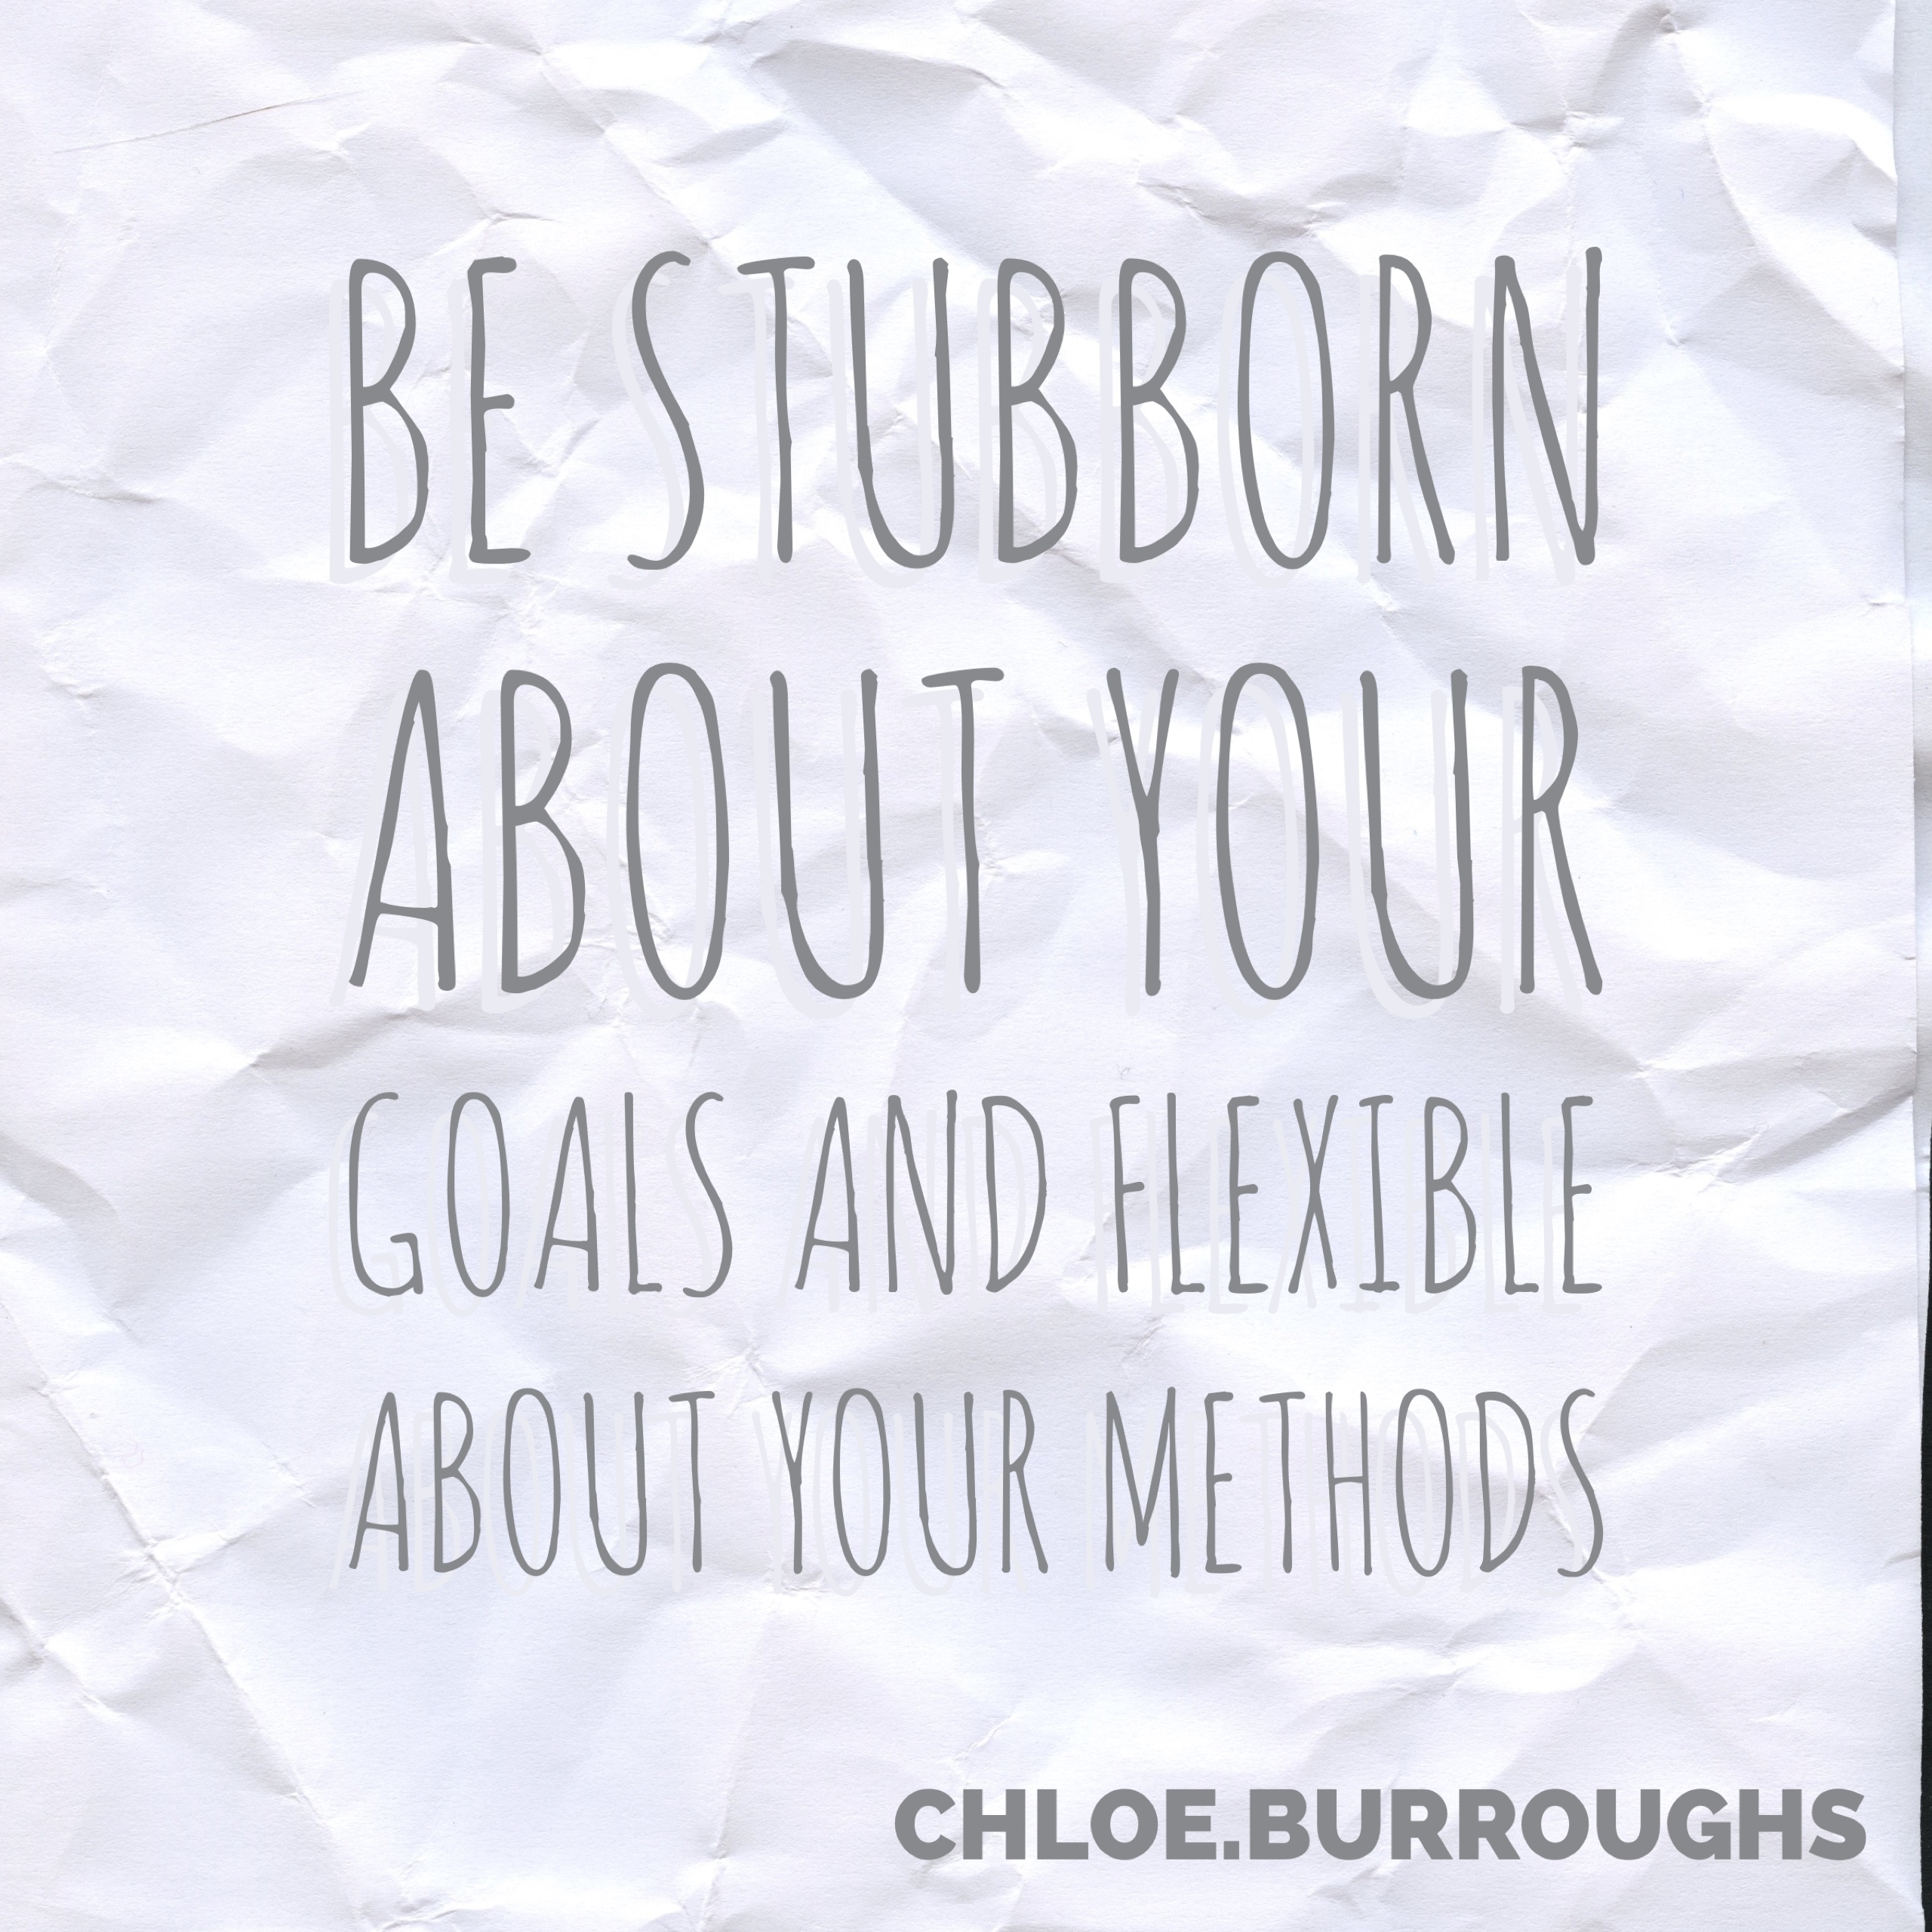 New student advice - flexible